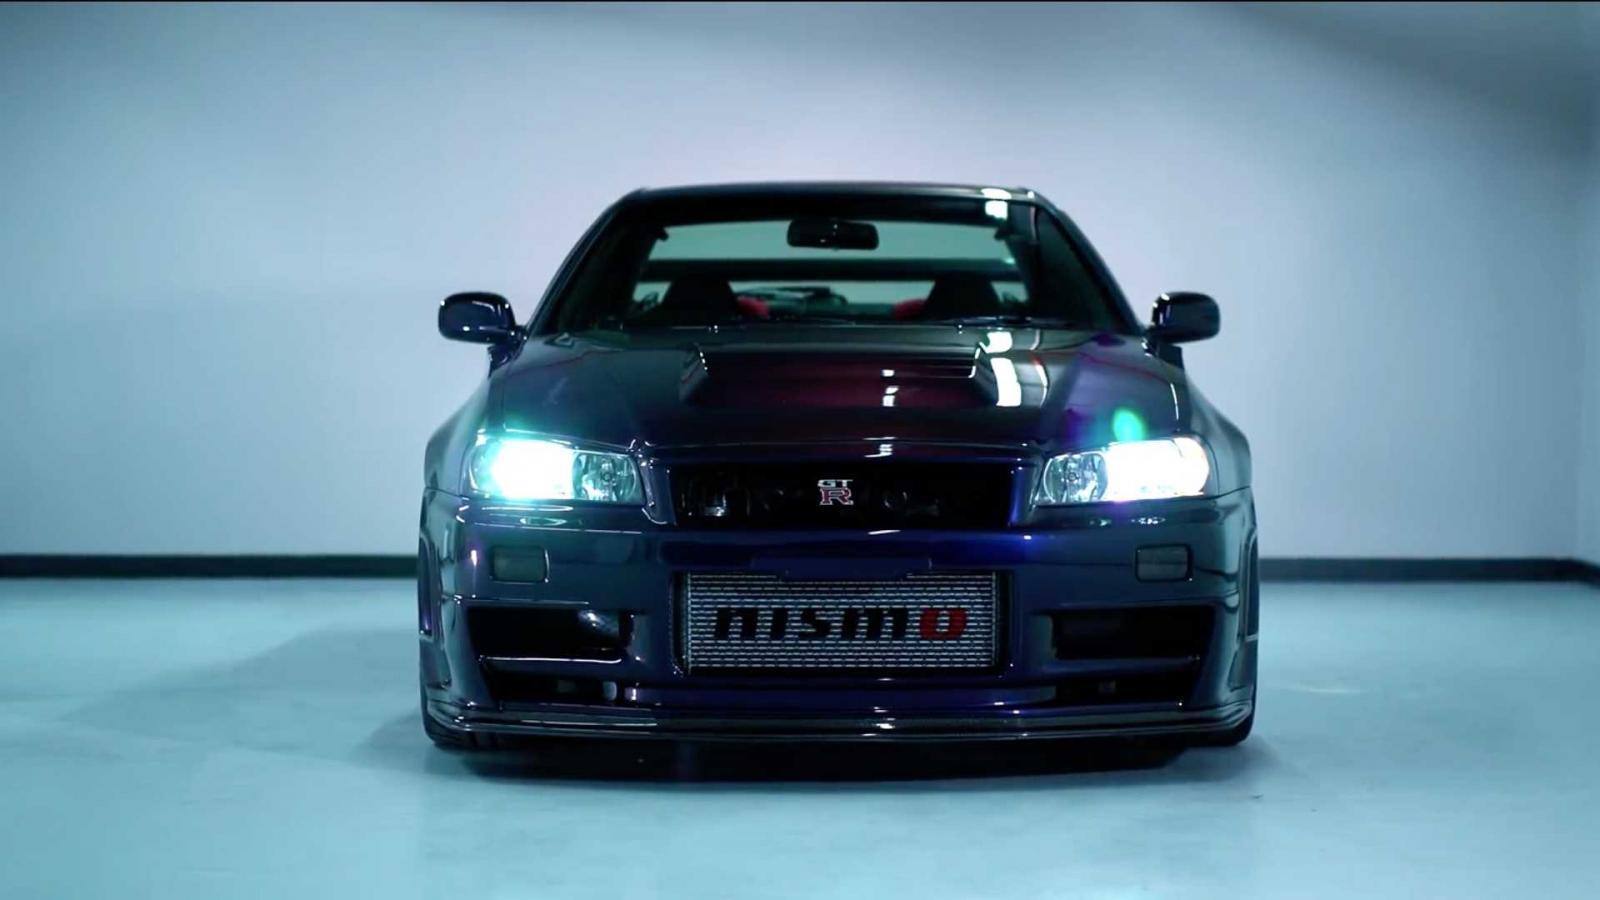 Nissan Skyline GT-R R34 Z-Tune